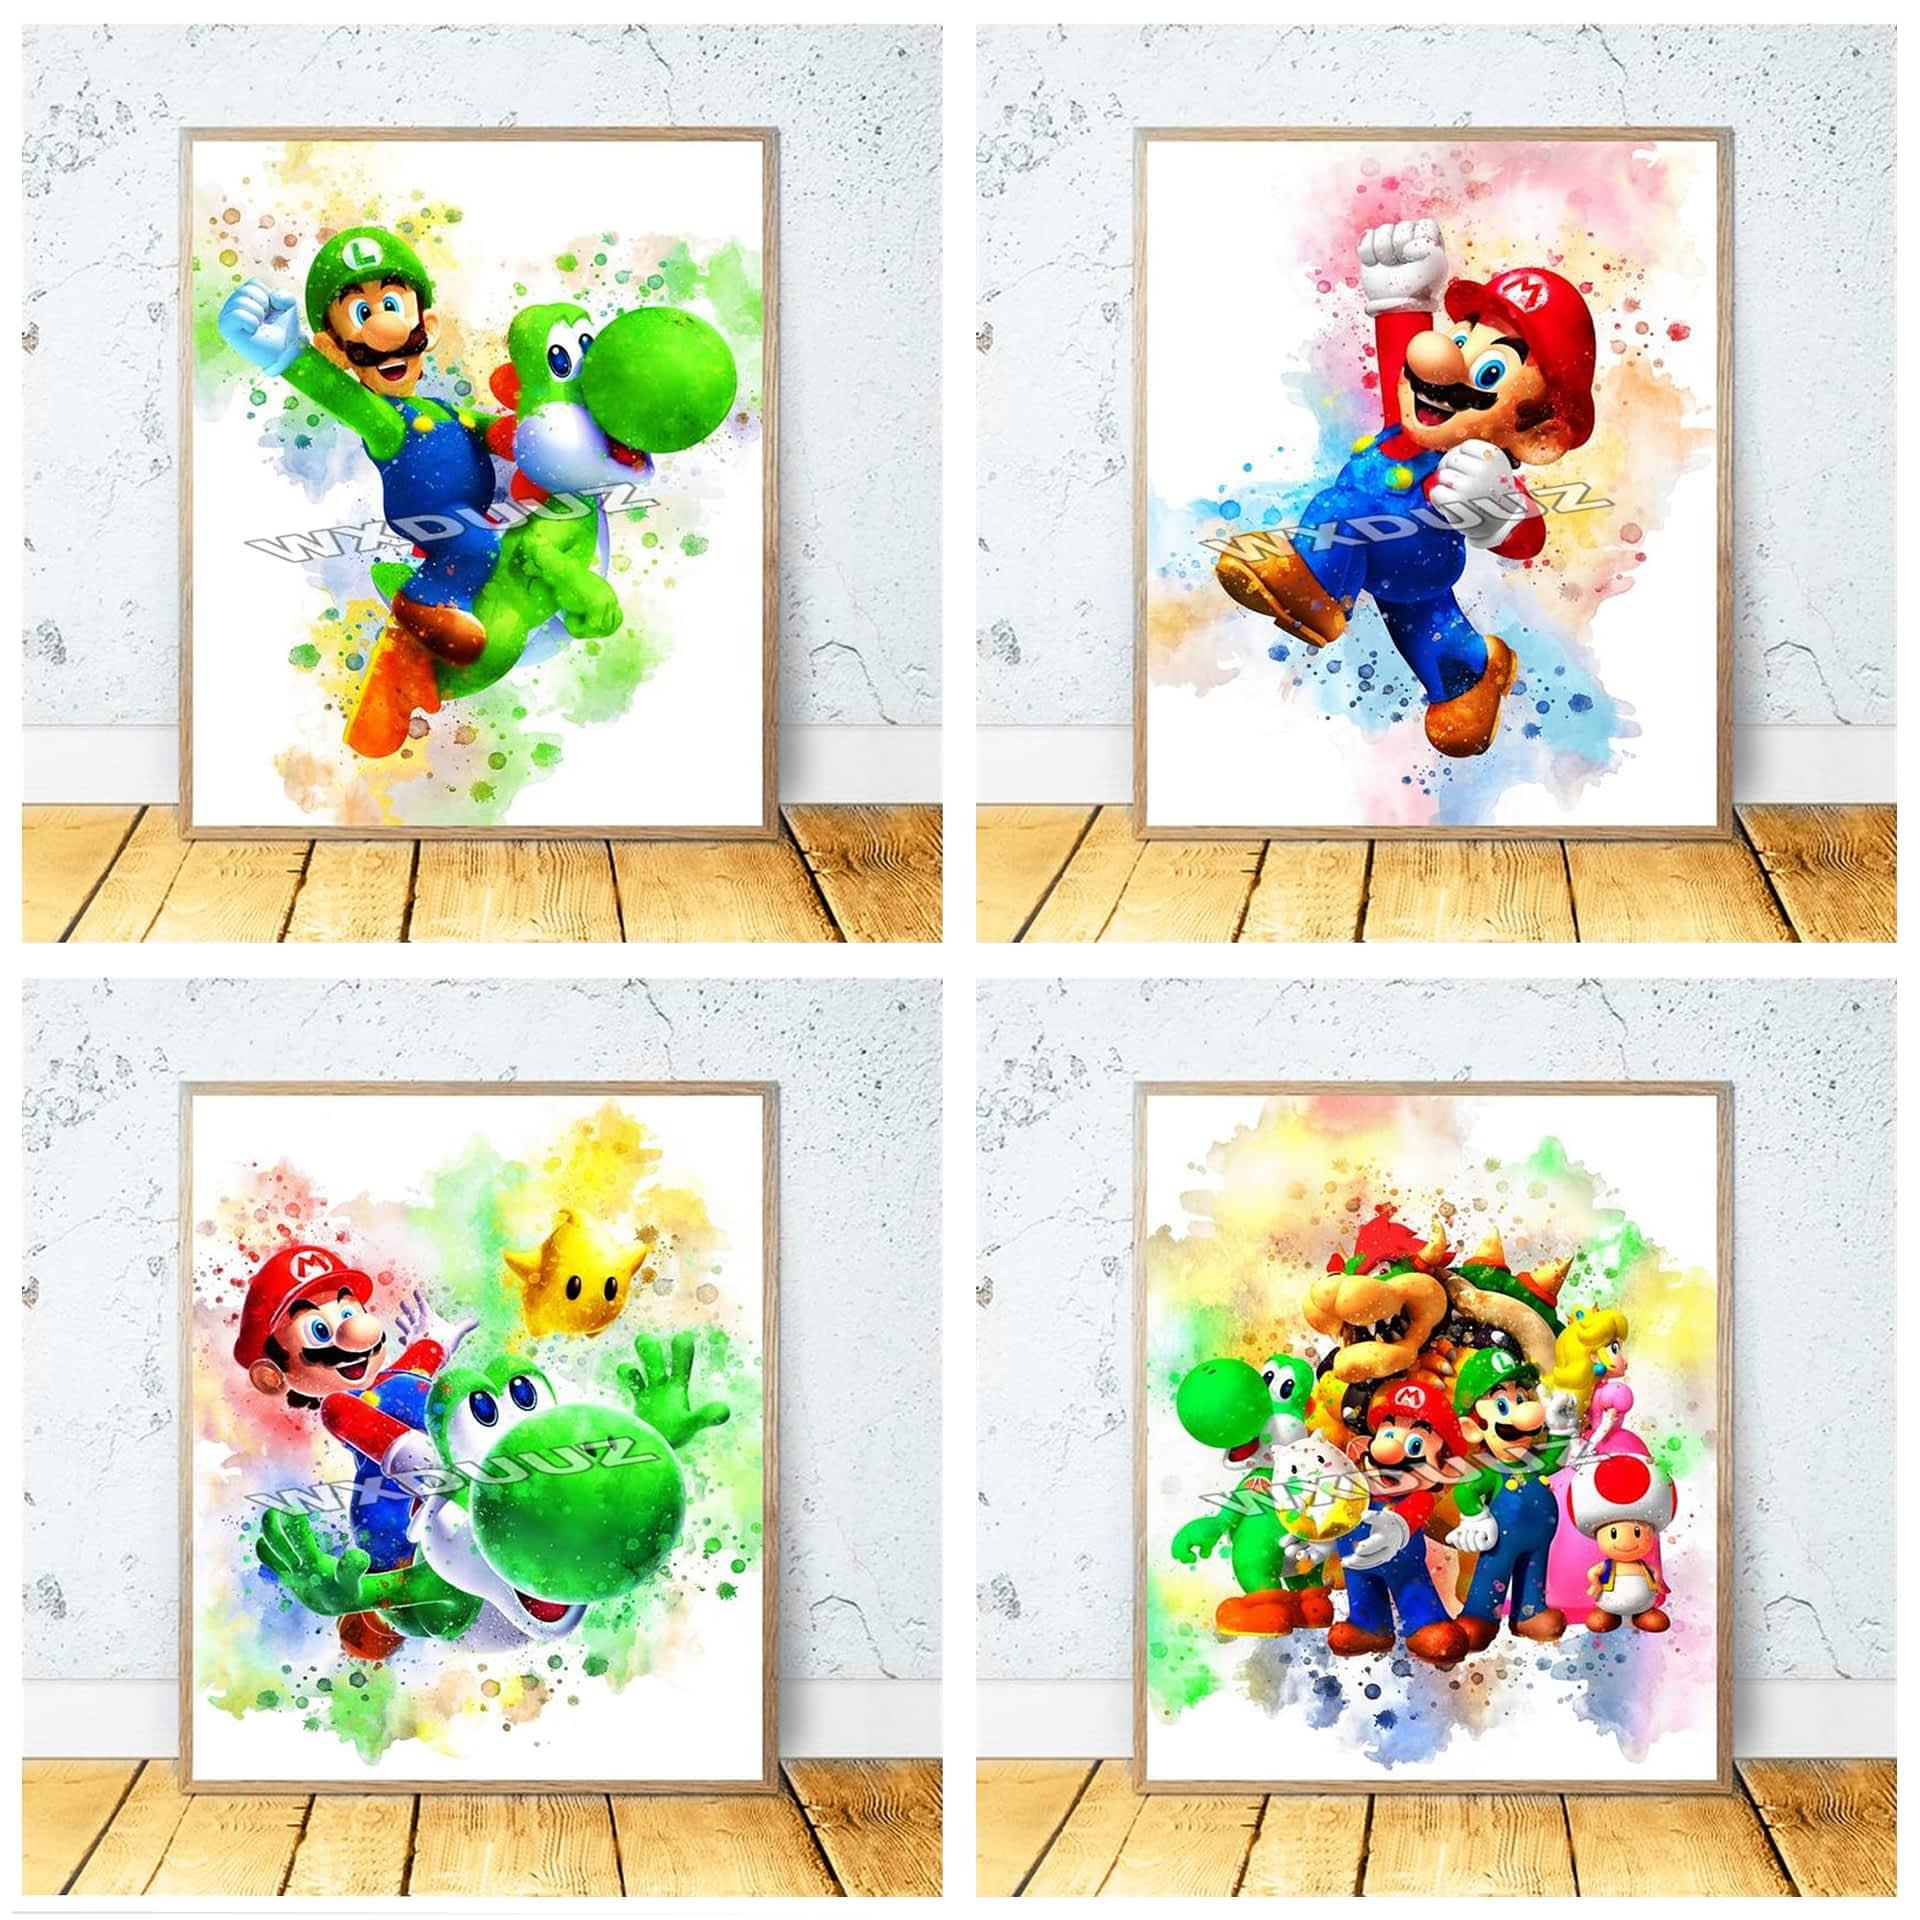 Japan-Anime-game-wall-art-painting-pictures-Nursery-Kids-Room-Painting-Cartoon-HD-Art-Decor-posters-7.jpg